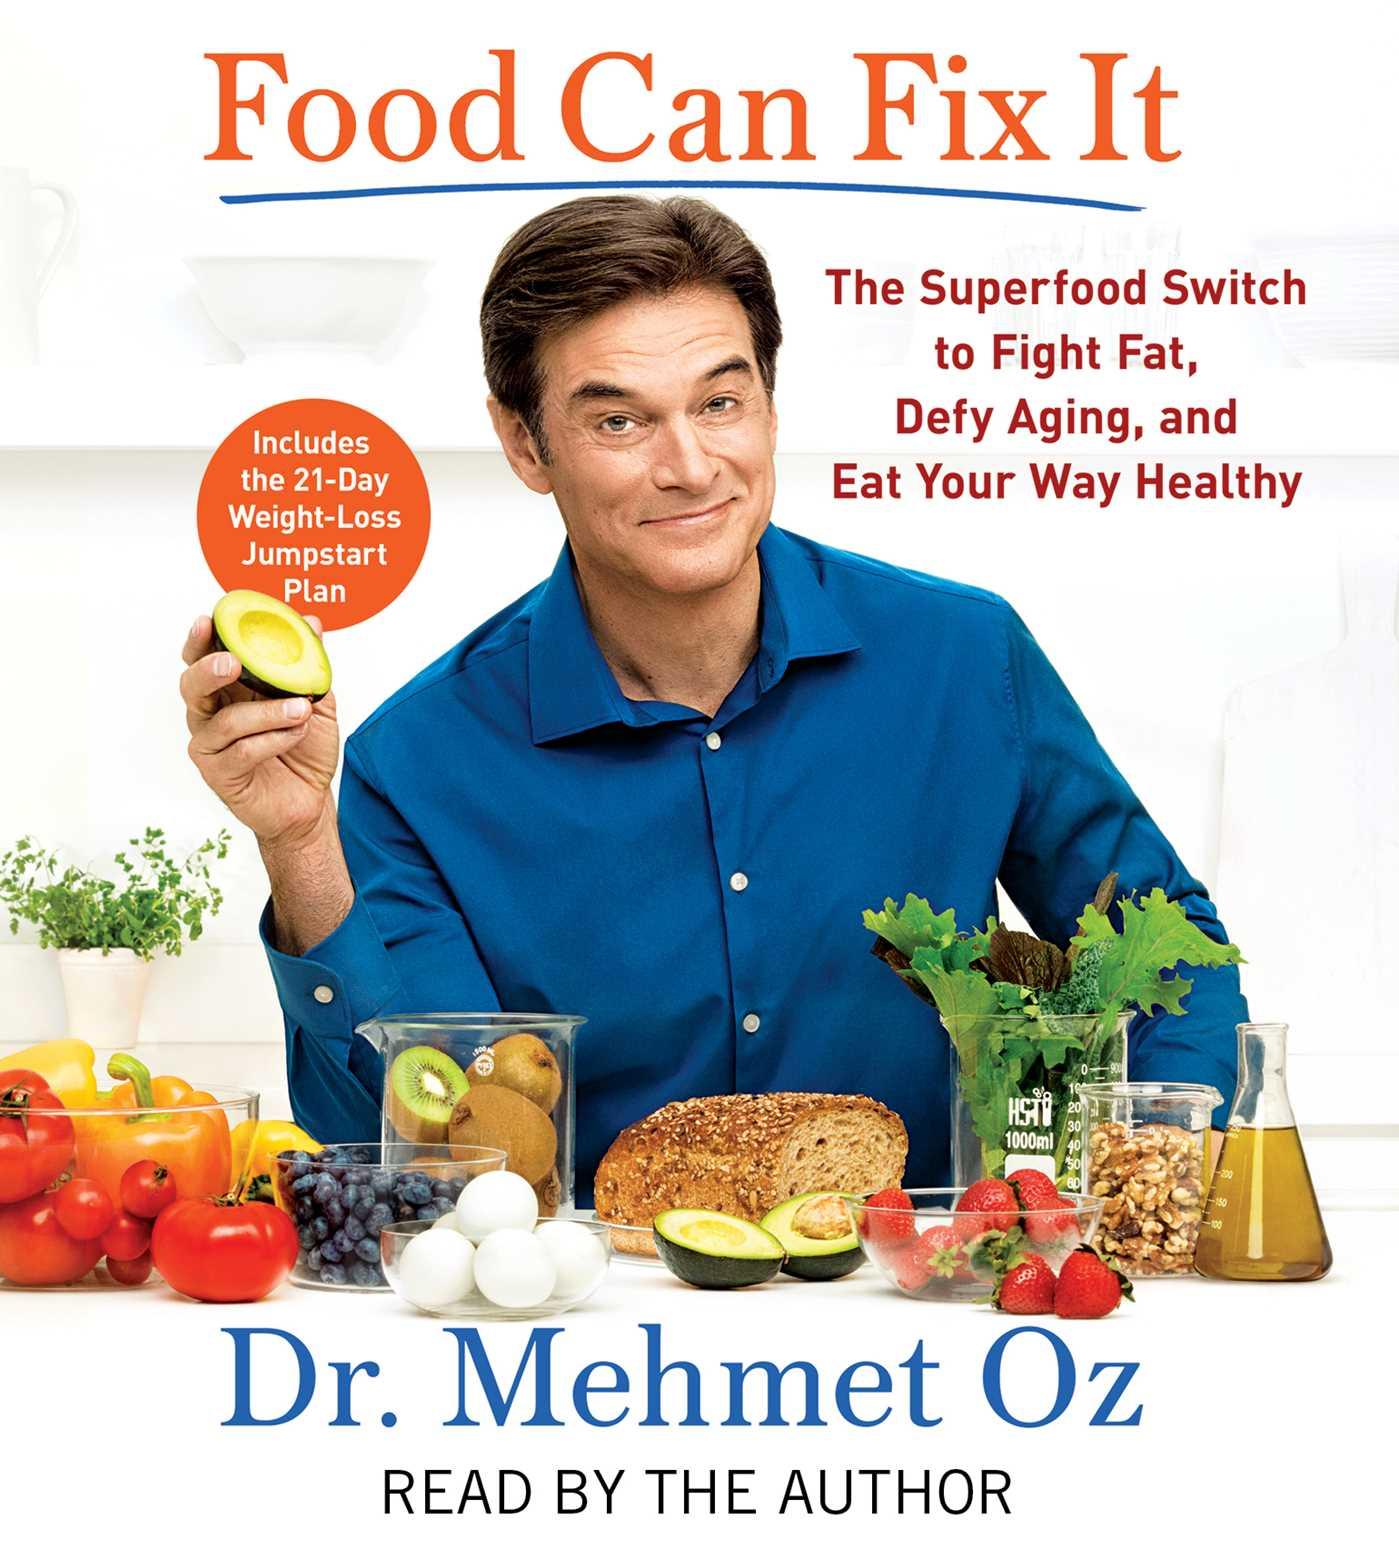 Food can fix it 9781508228547 hr